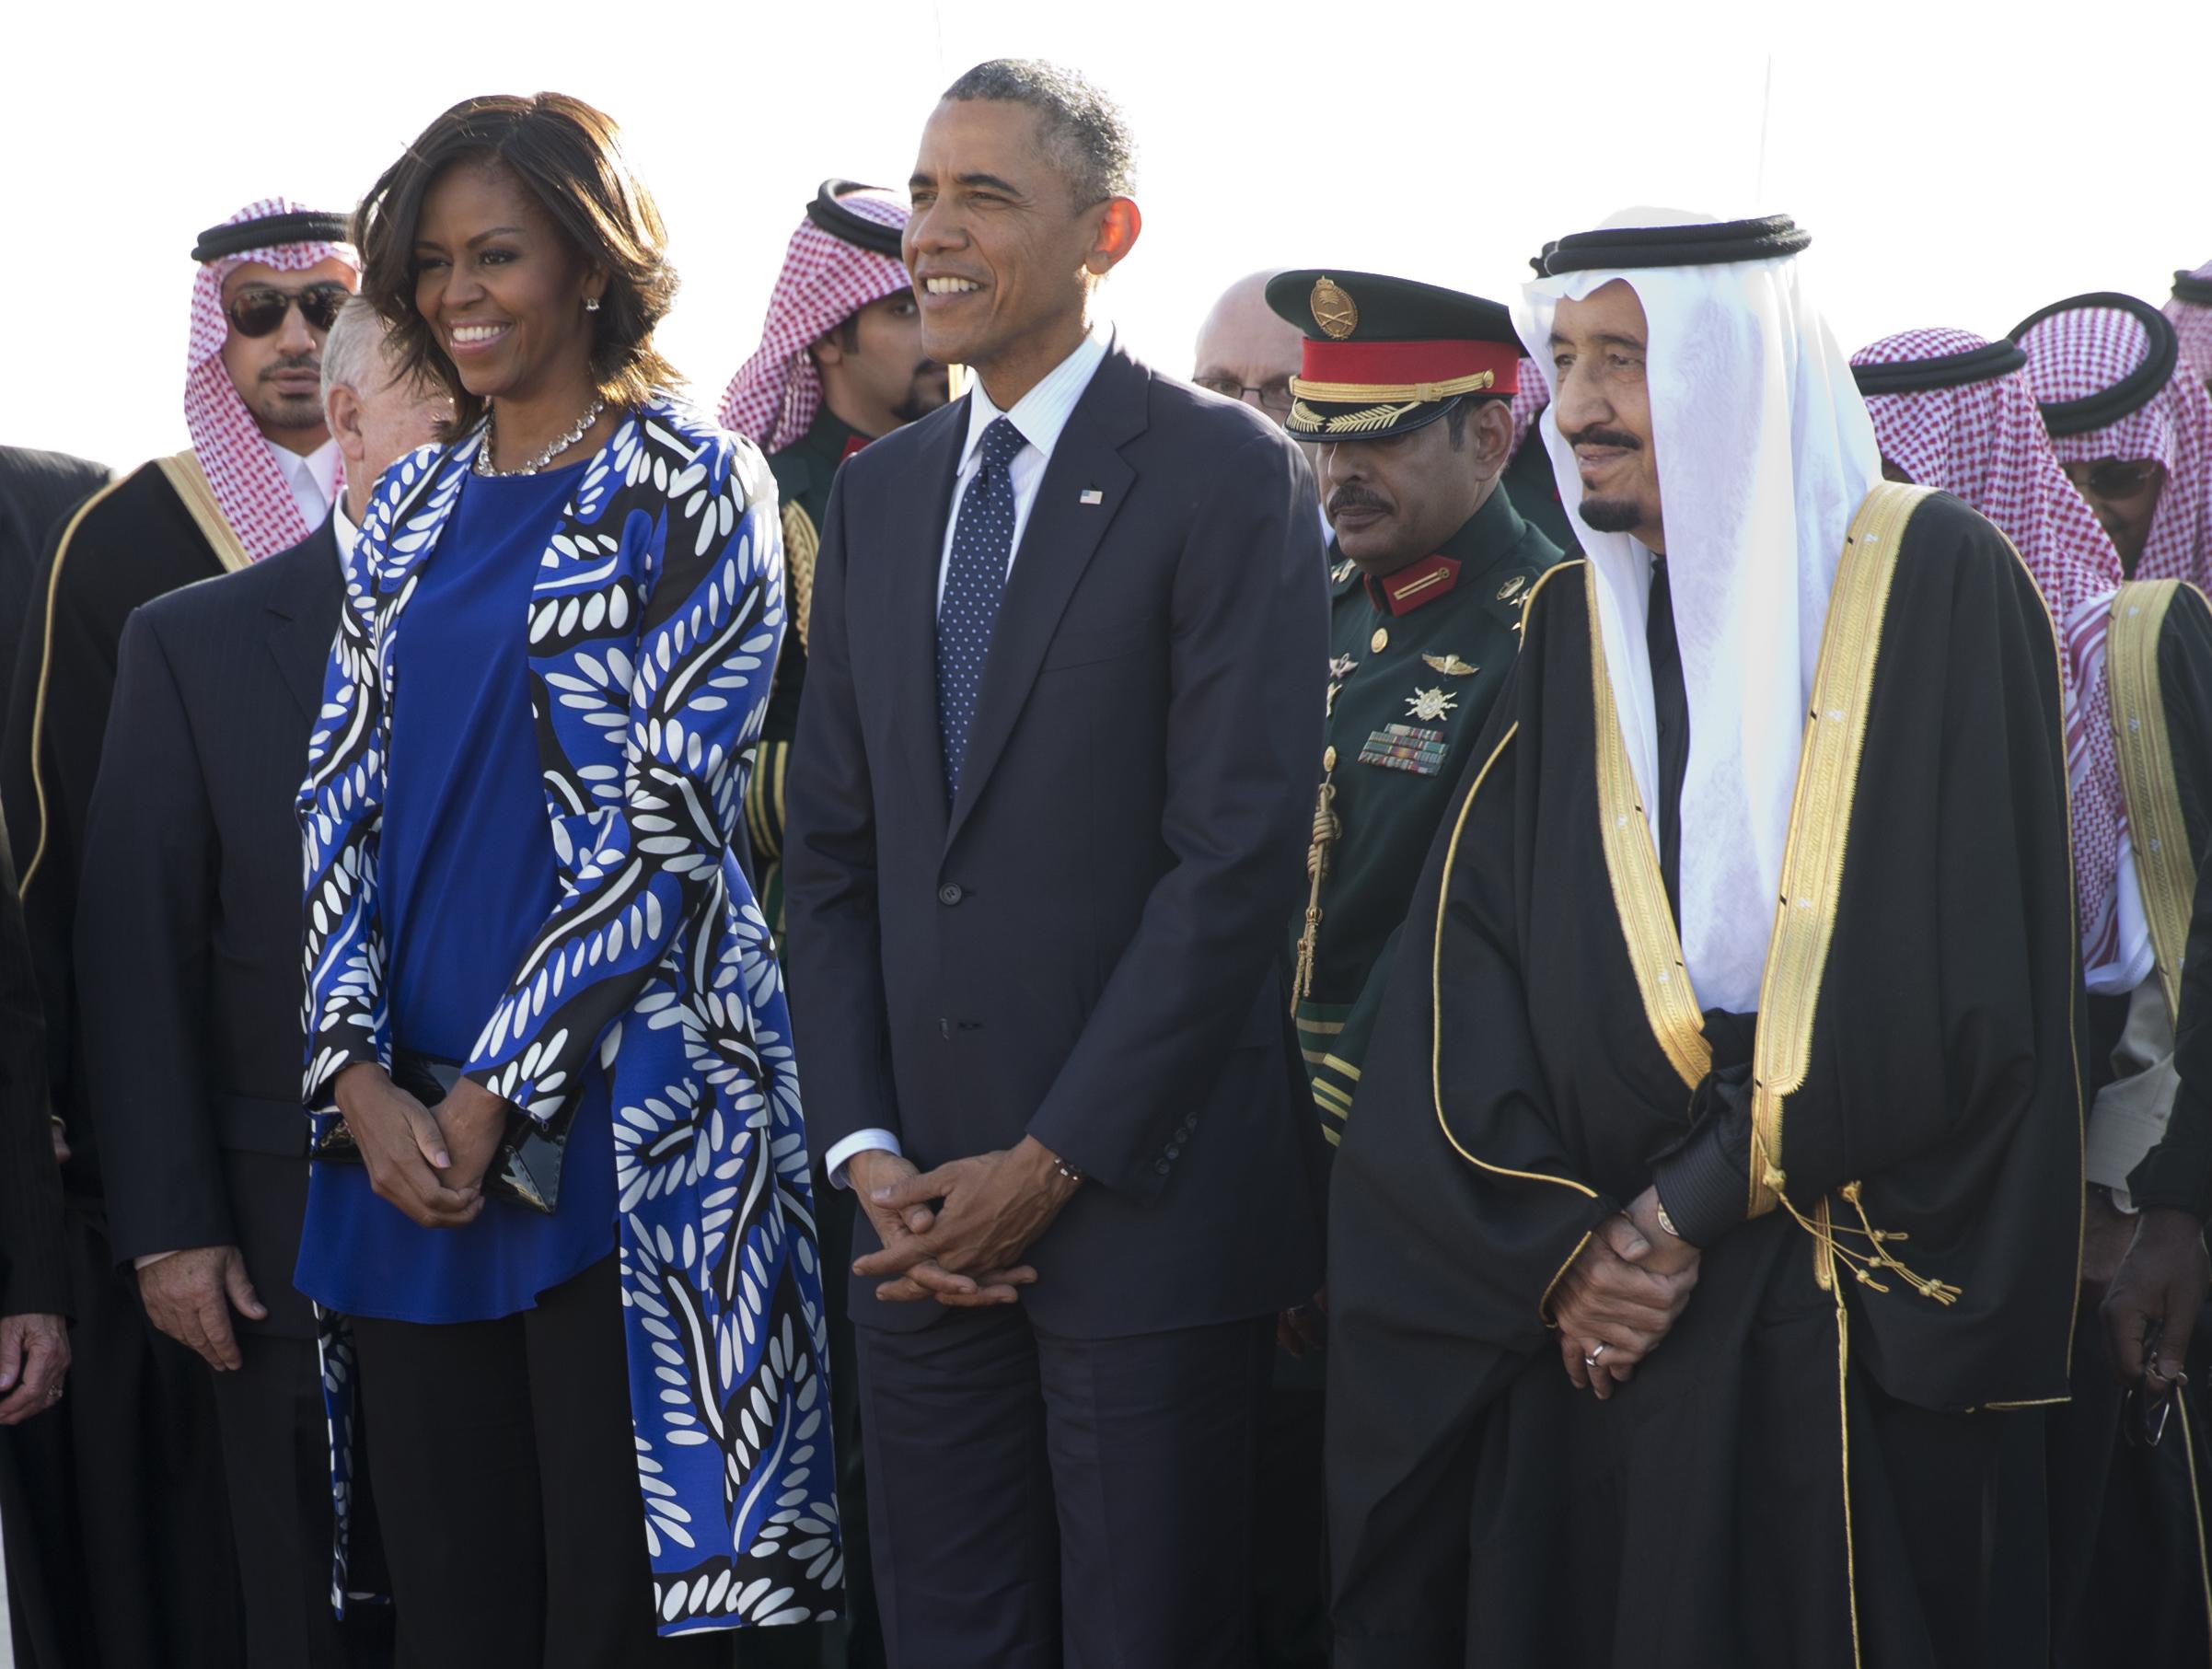 President Barack Obama and first lady Michelle Obama stand with new Saudi King Salman bin Abdul Aziz they arrive on Air Force One at King Khalid International Airport, in Riyadh, Saudi Arabia, Tuesday, Jan. 27, 2015. (AP Photo/Carolyn Kaster)